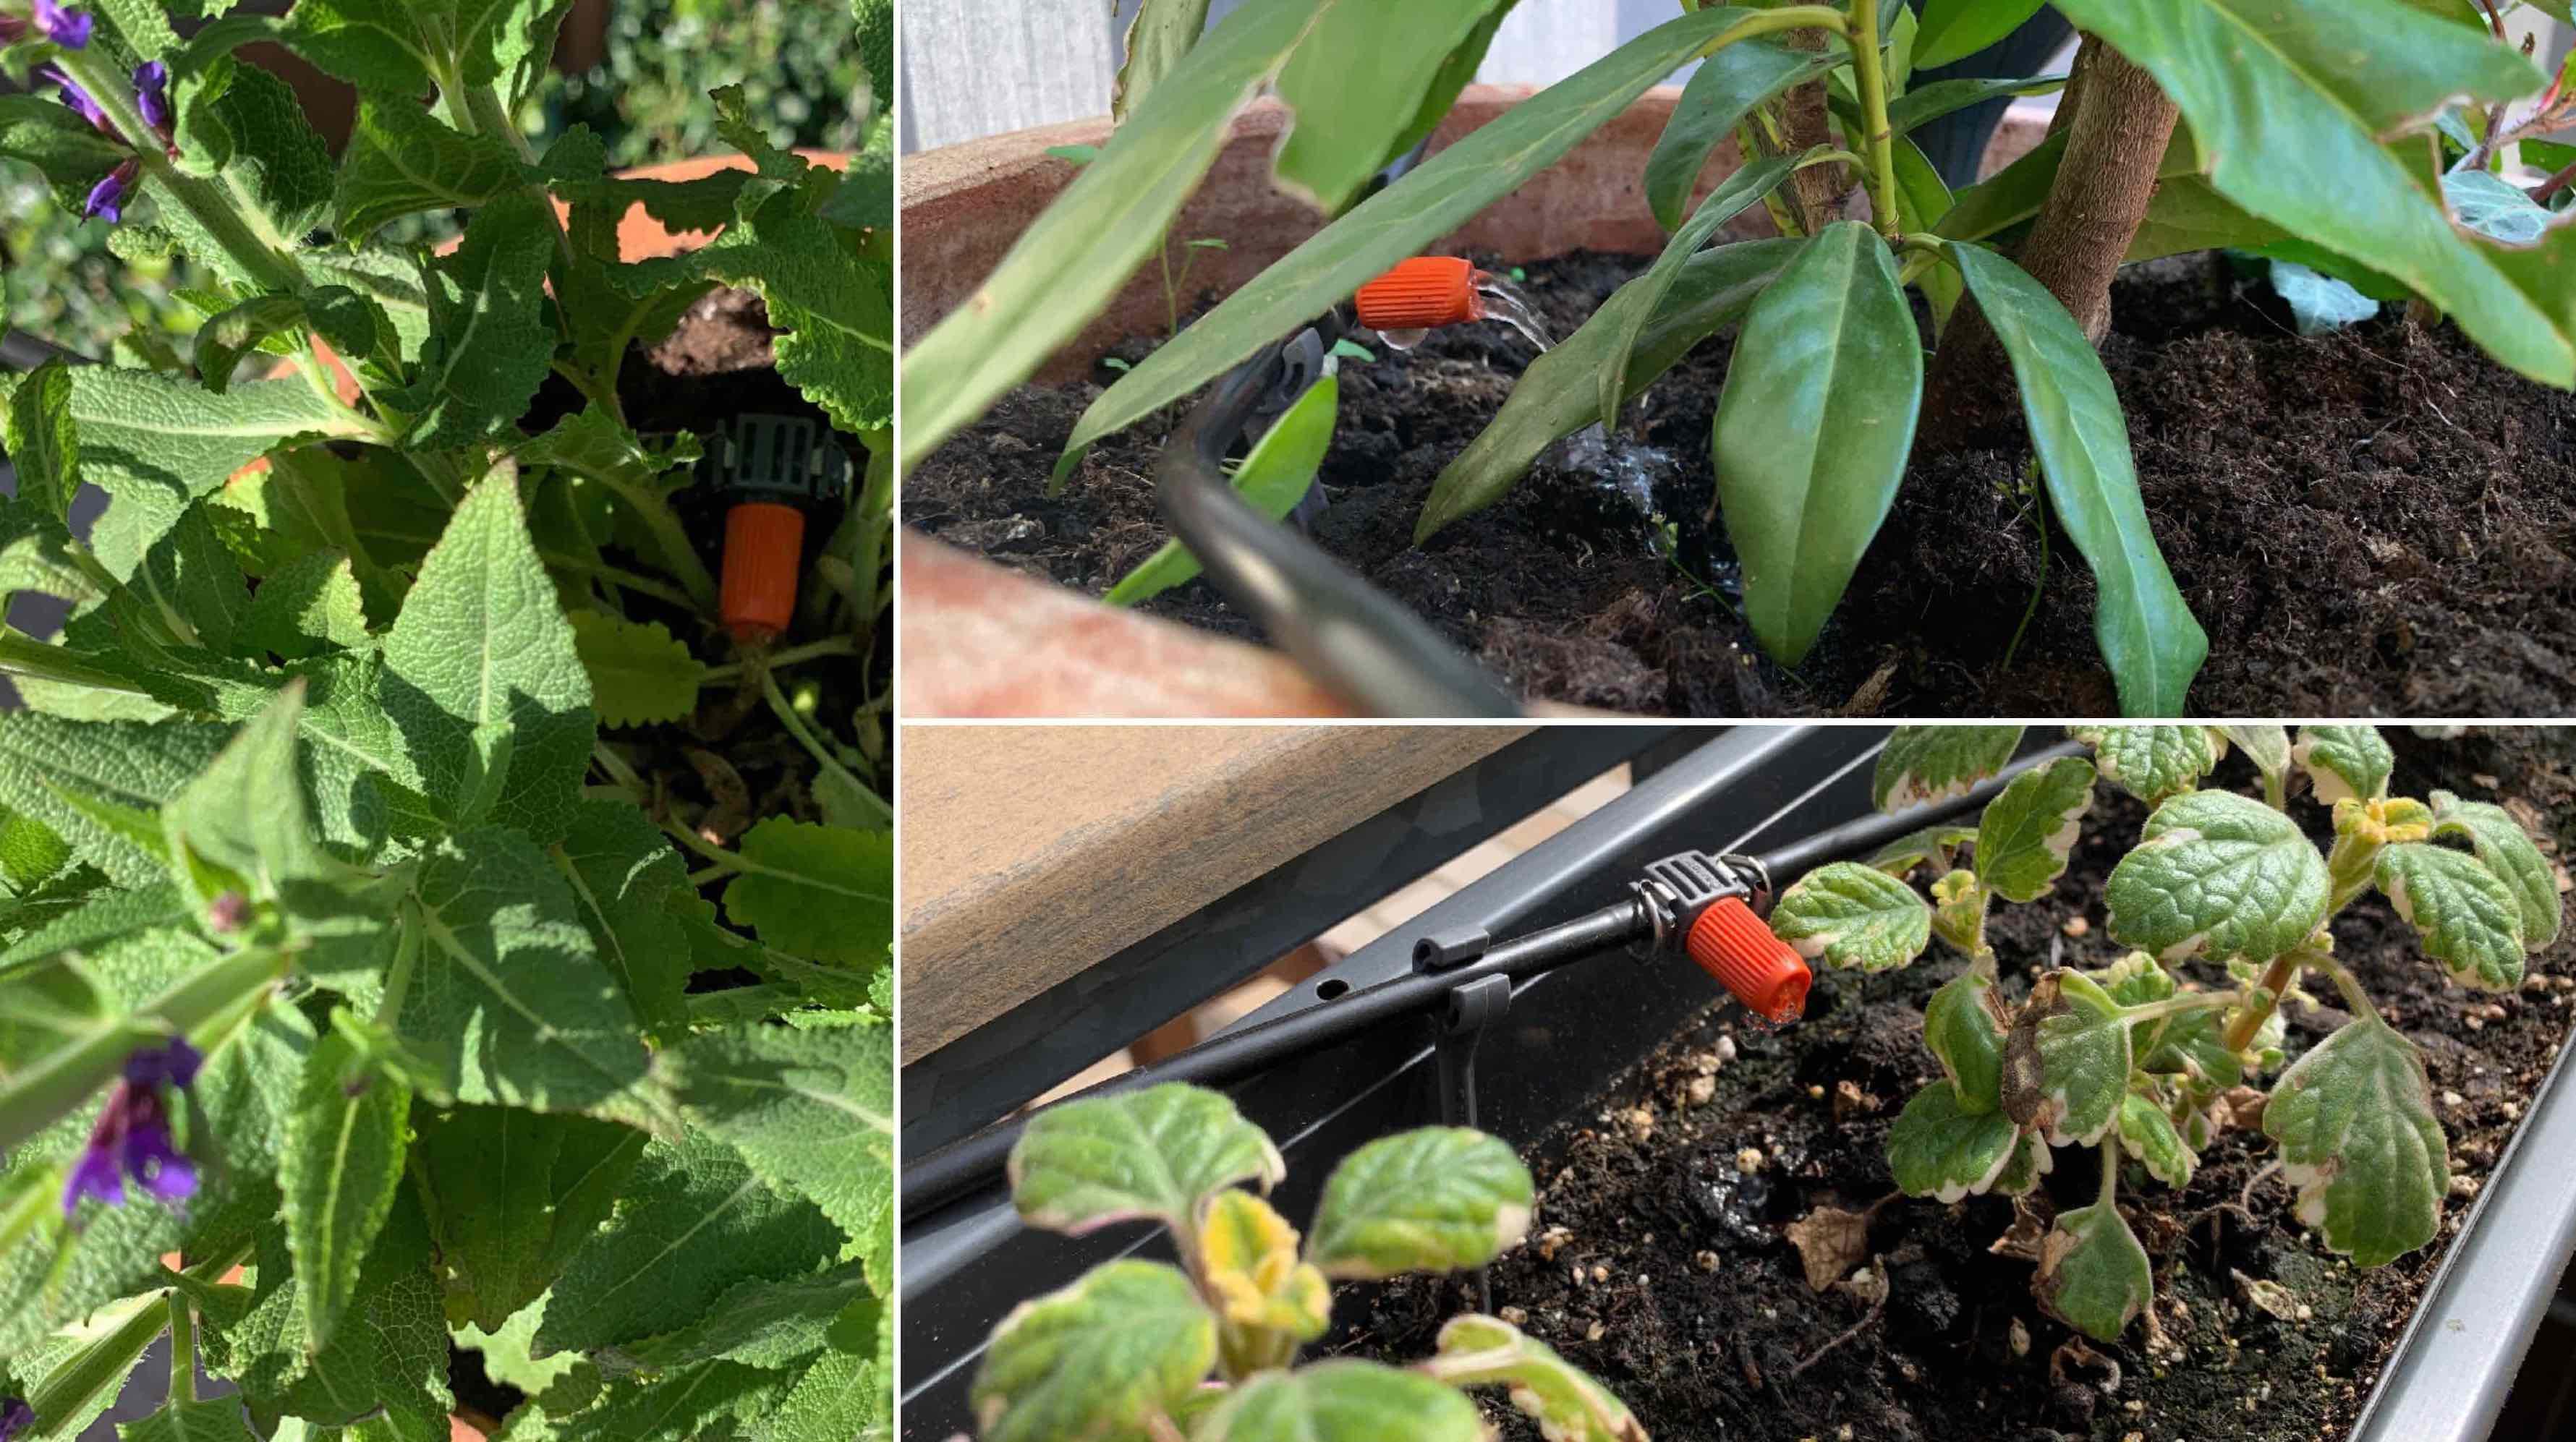 Eve_Aqua_HomeKit_Gardena_Terrasse_Balkon_Pflanzen_Bewässerung1 Wie HomeKit deine Pflanzen auf Balkon/Terrasse automatisiert bewässert